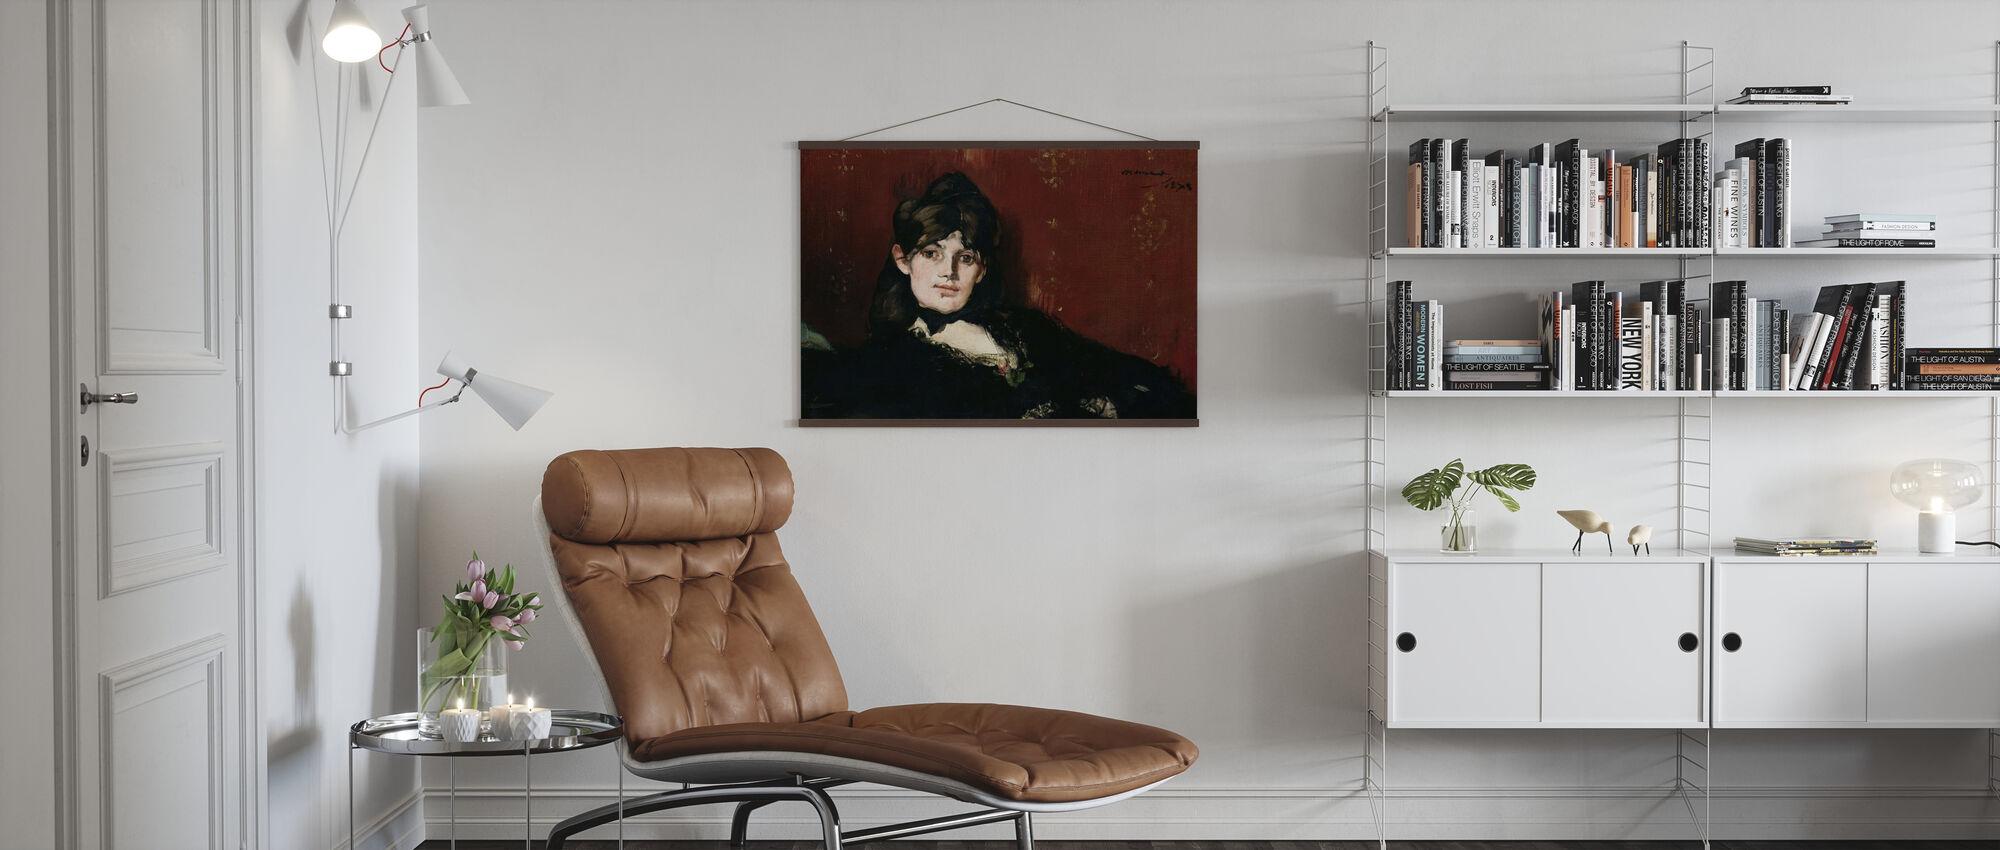 Berthe Morisot, Edouard Manet - Poster - Living Room